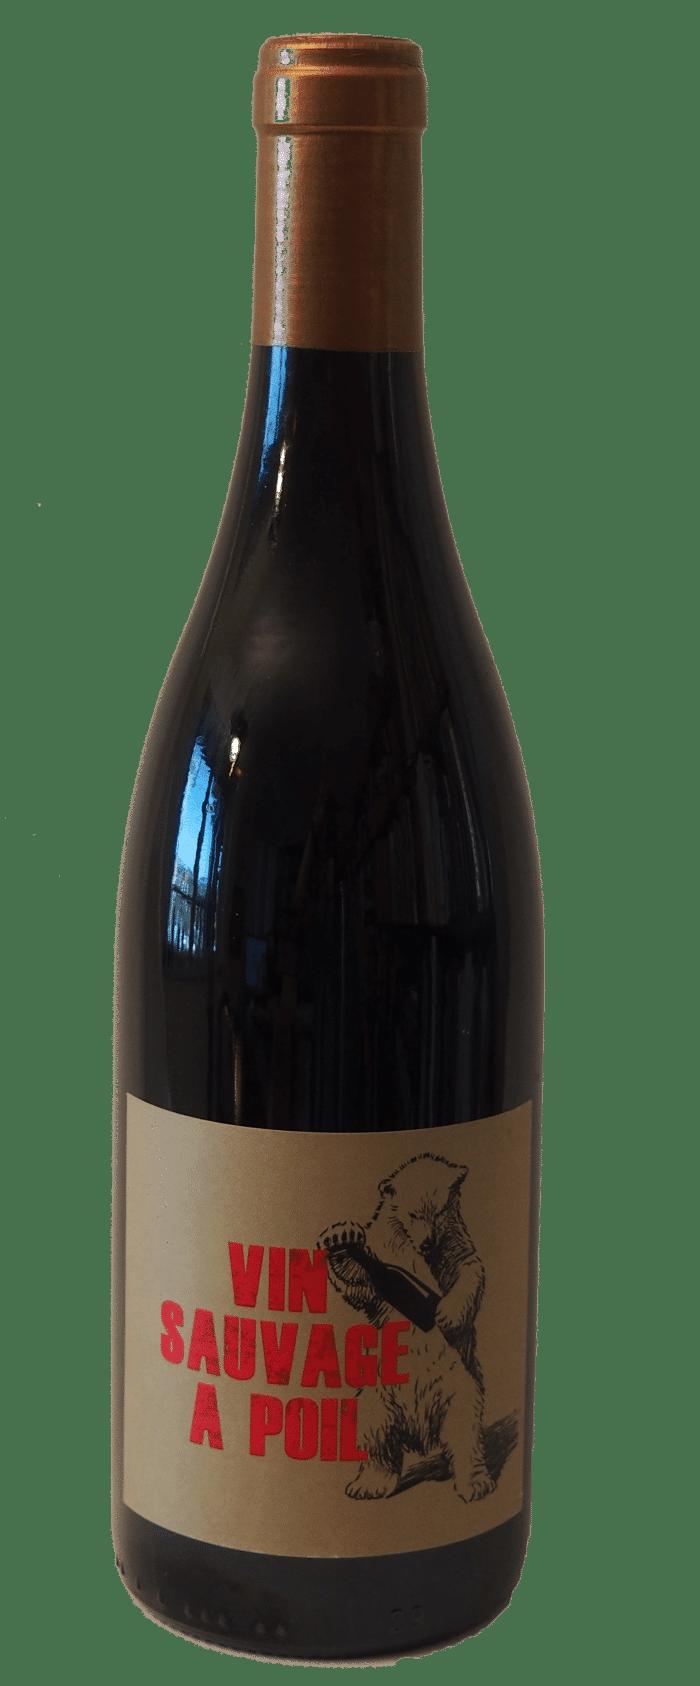 Régnié Vin Sauvage á Poil   Frankrijk   gemaakt van de druif: Gamay